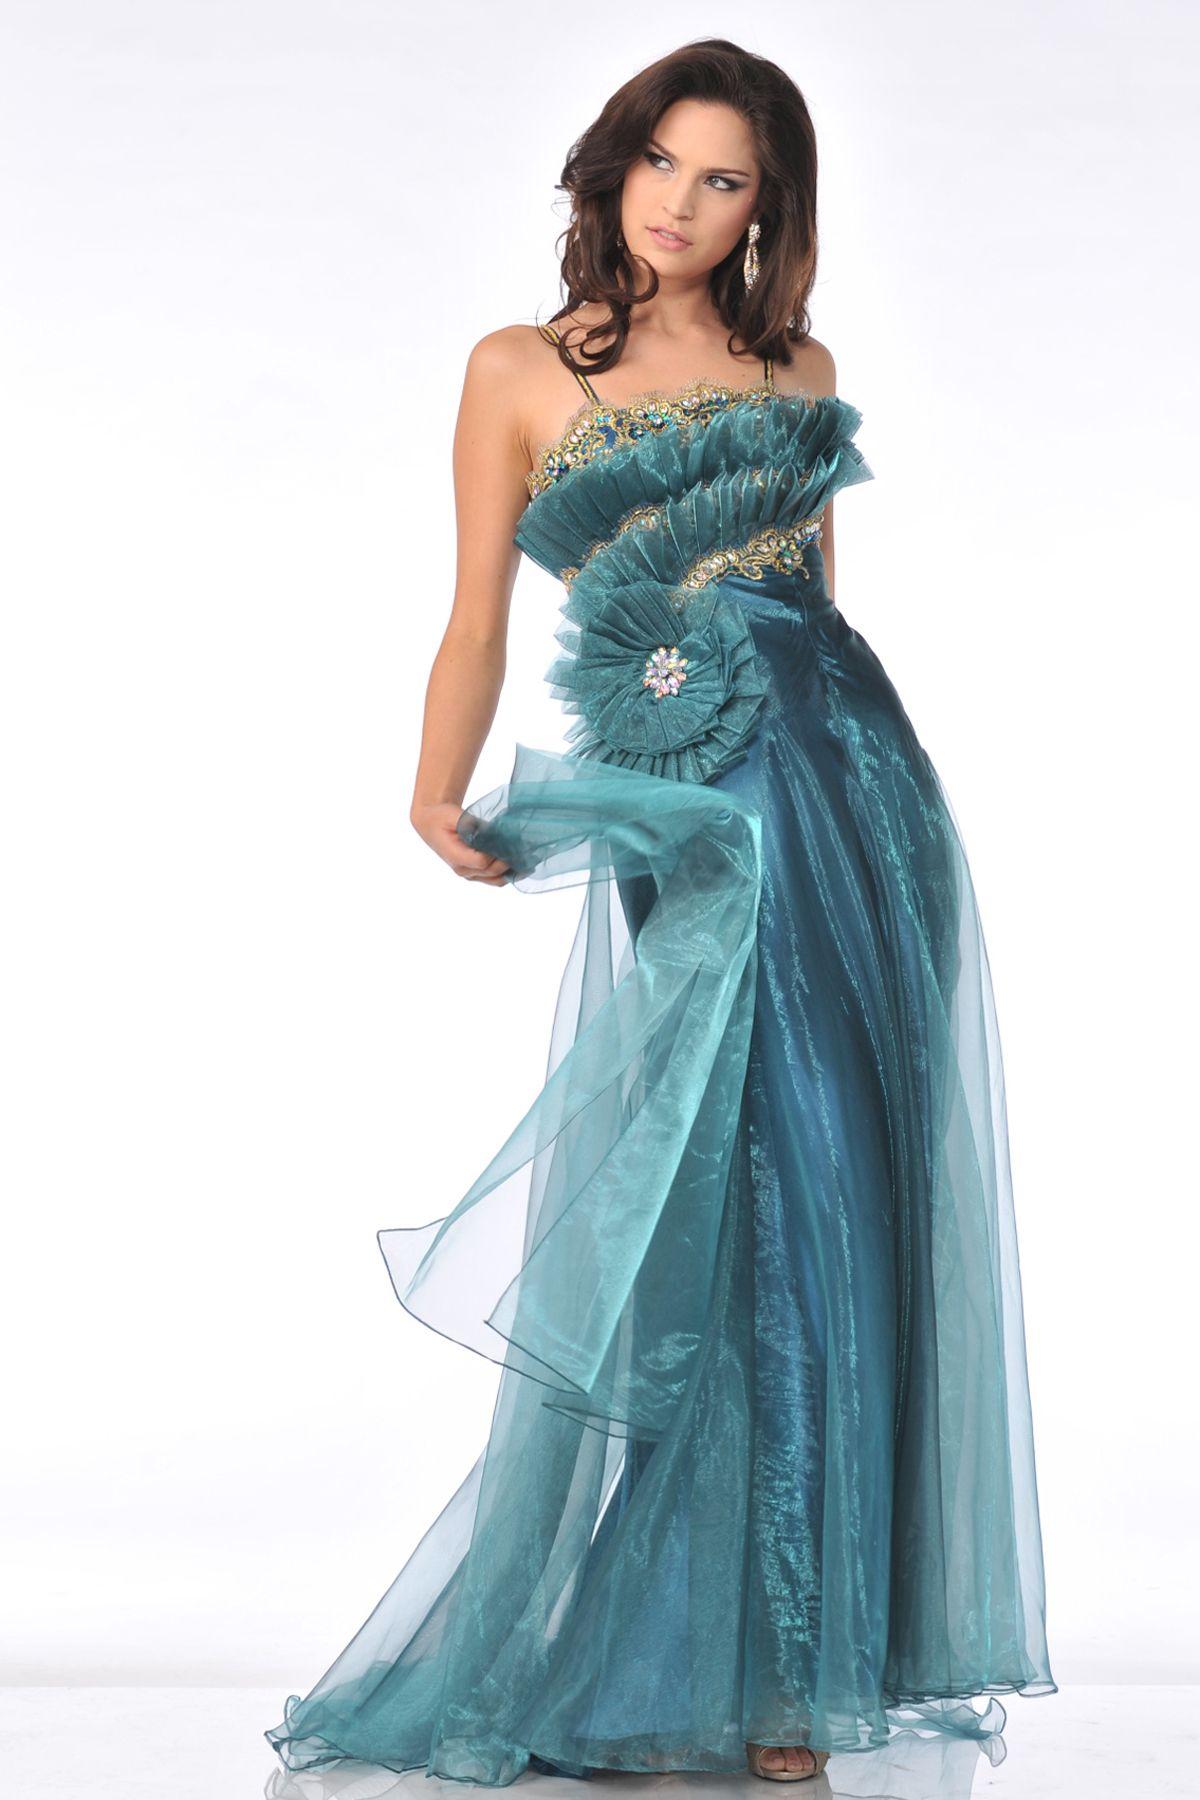 CDK21102 Spaghetti Strapped Ruffle Tulle Pattern Prom Dress